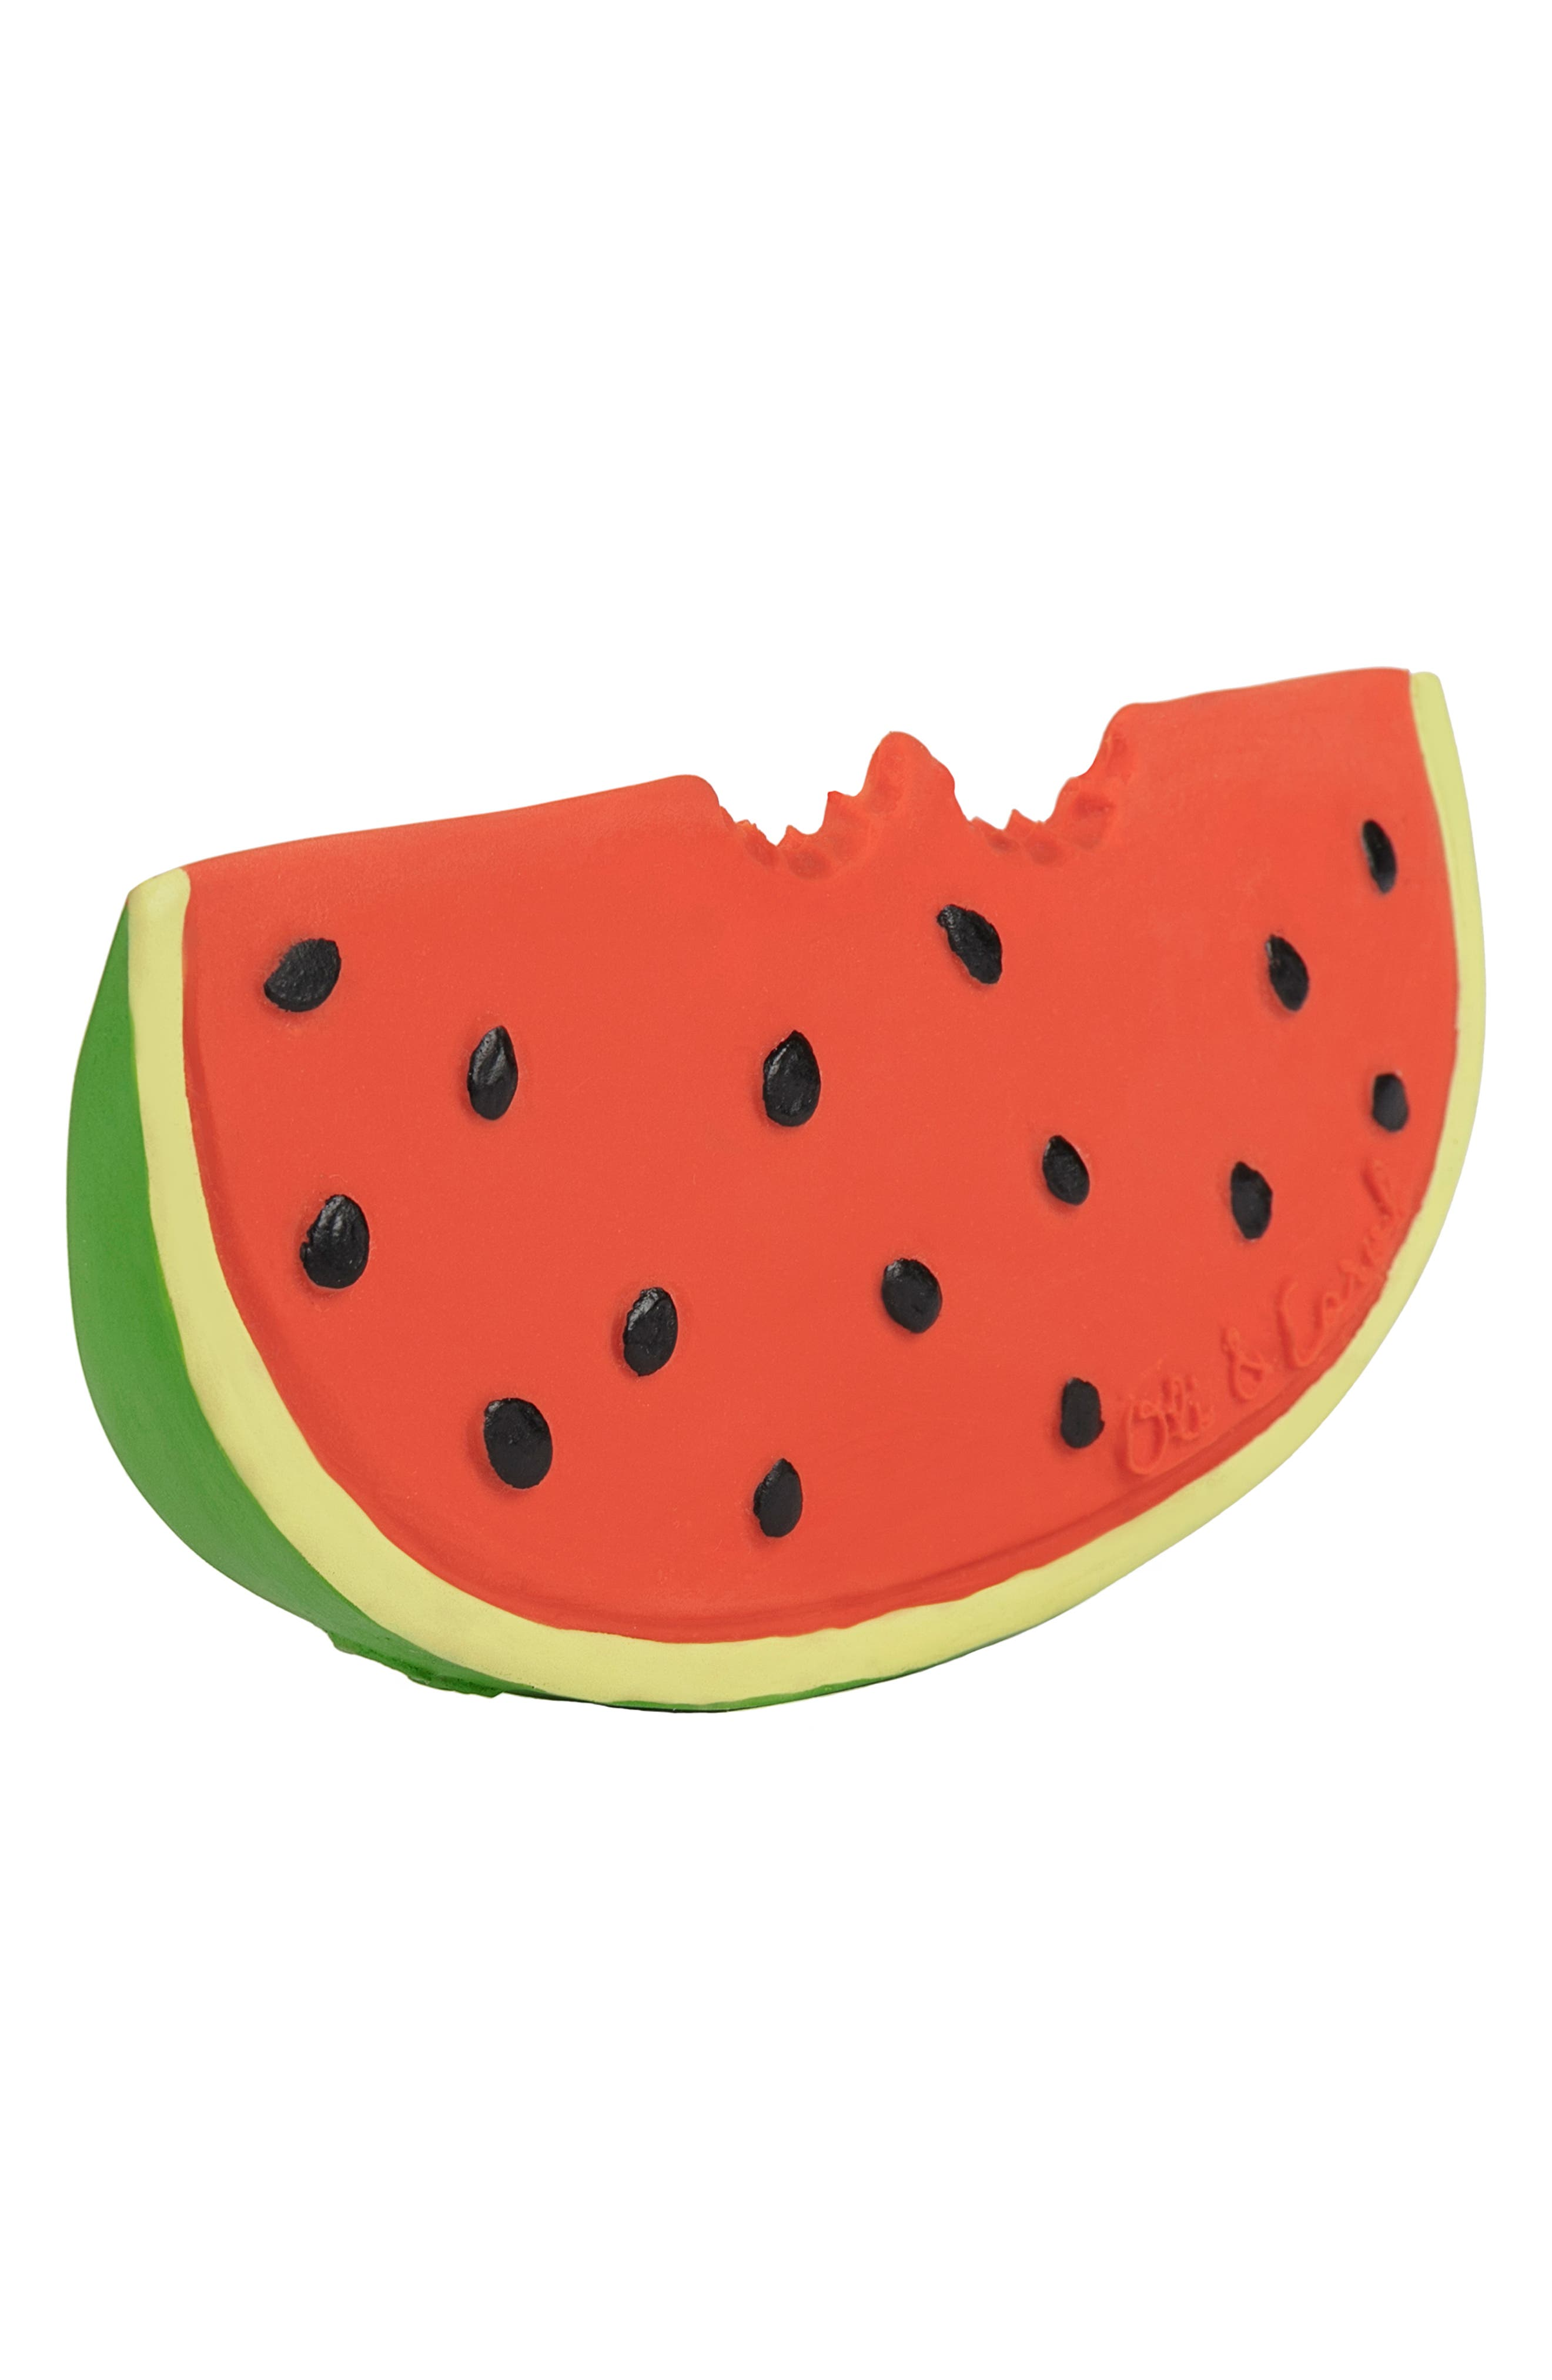 OLI & CAROL, Oli and Carol Wally the Watermelon Teething Toy, Alternate thumbnail 3, color, 600